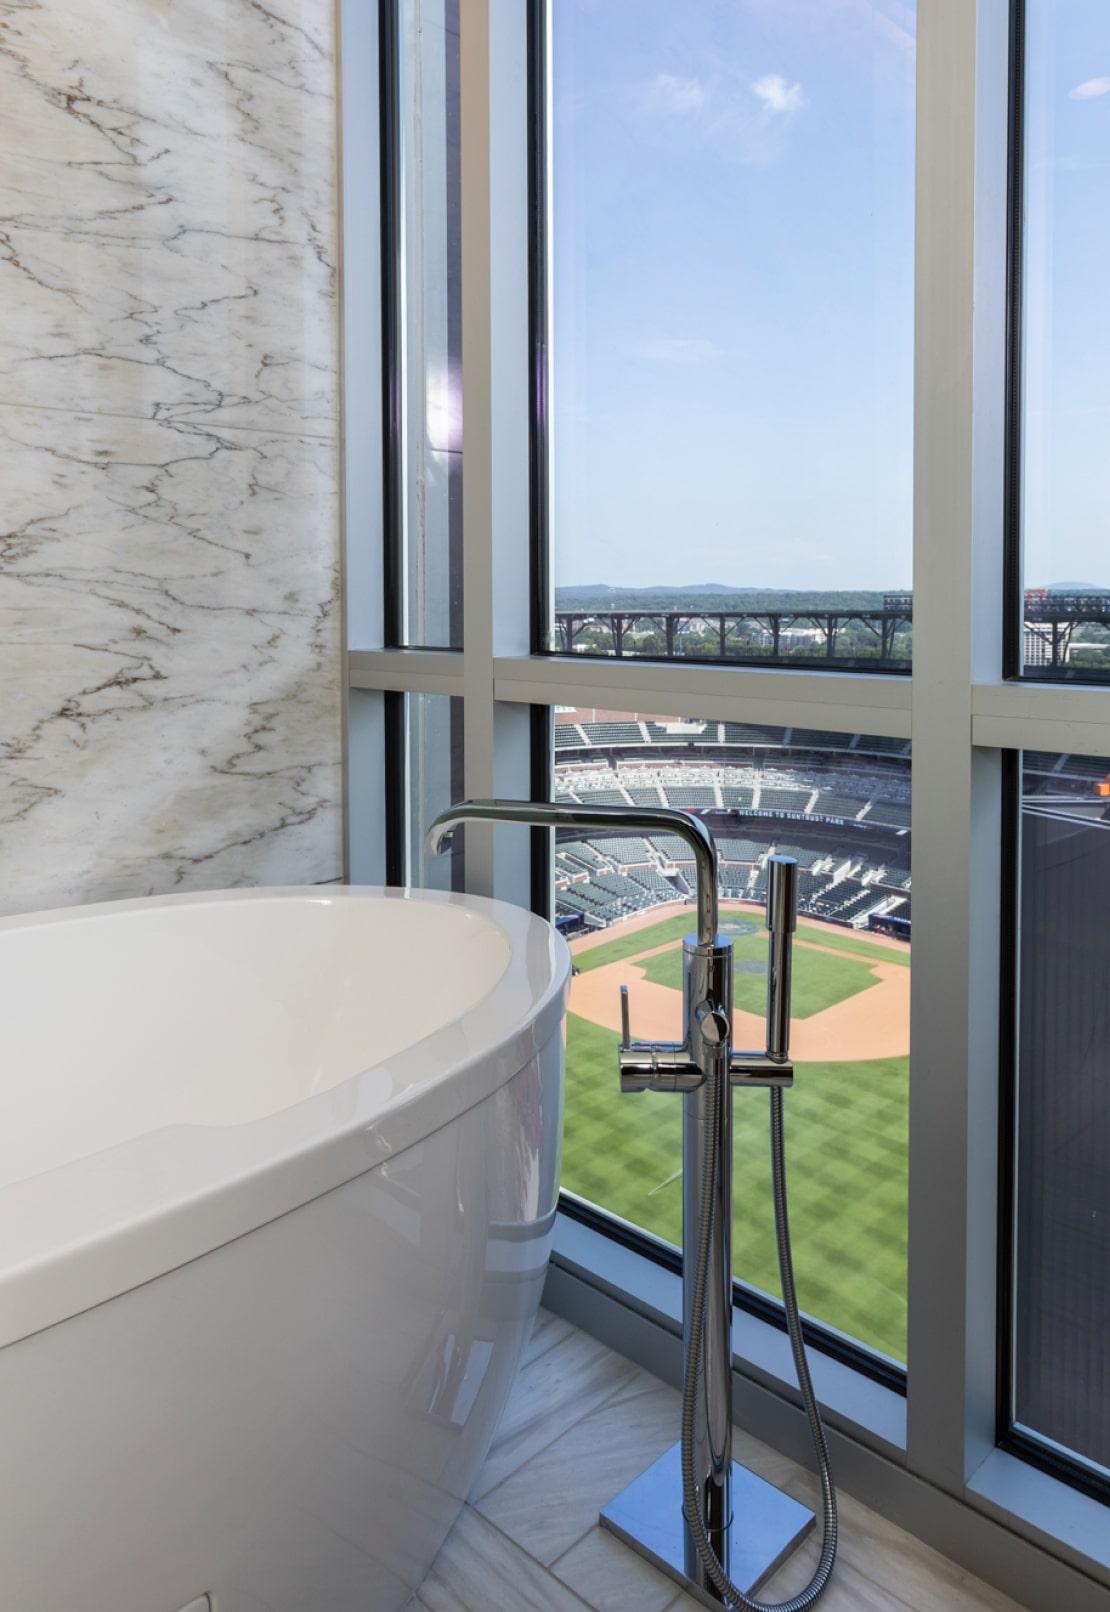 View of Atlanta Braves baseball stadium